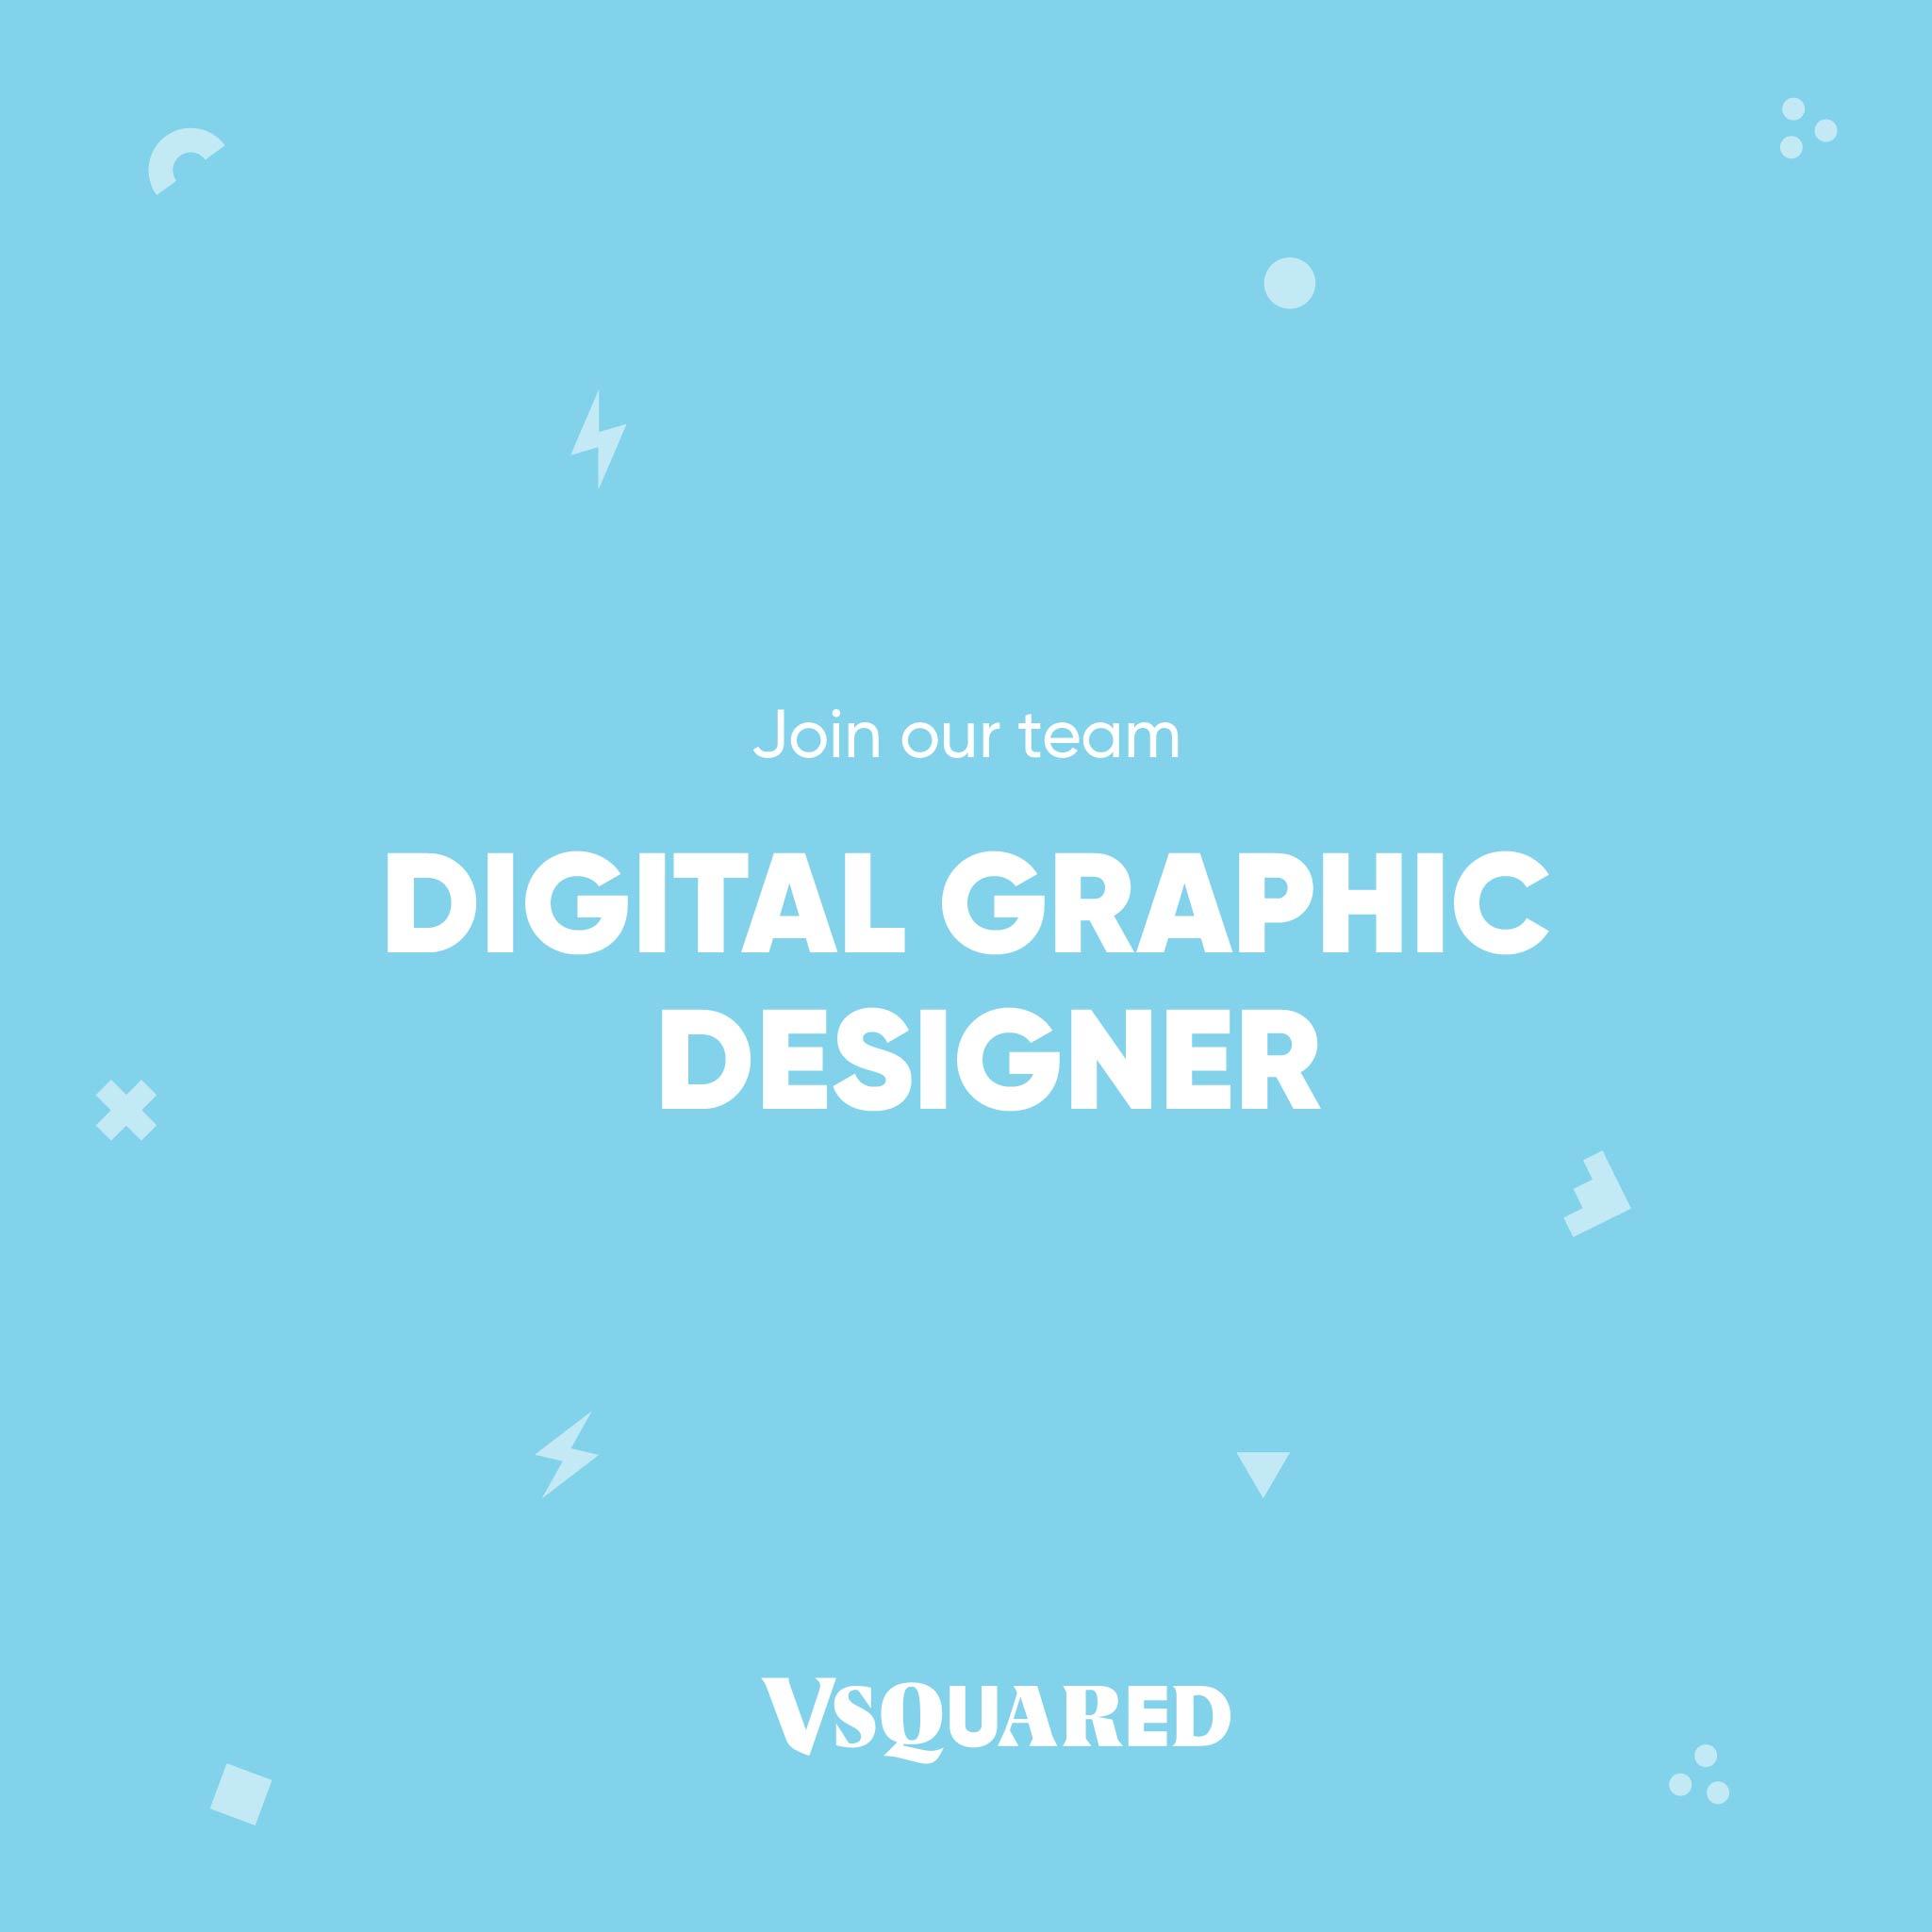 VSQUARED Digital Graphic Designer